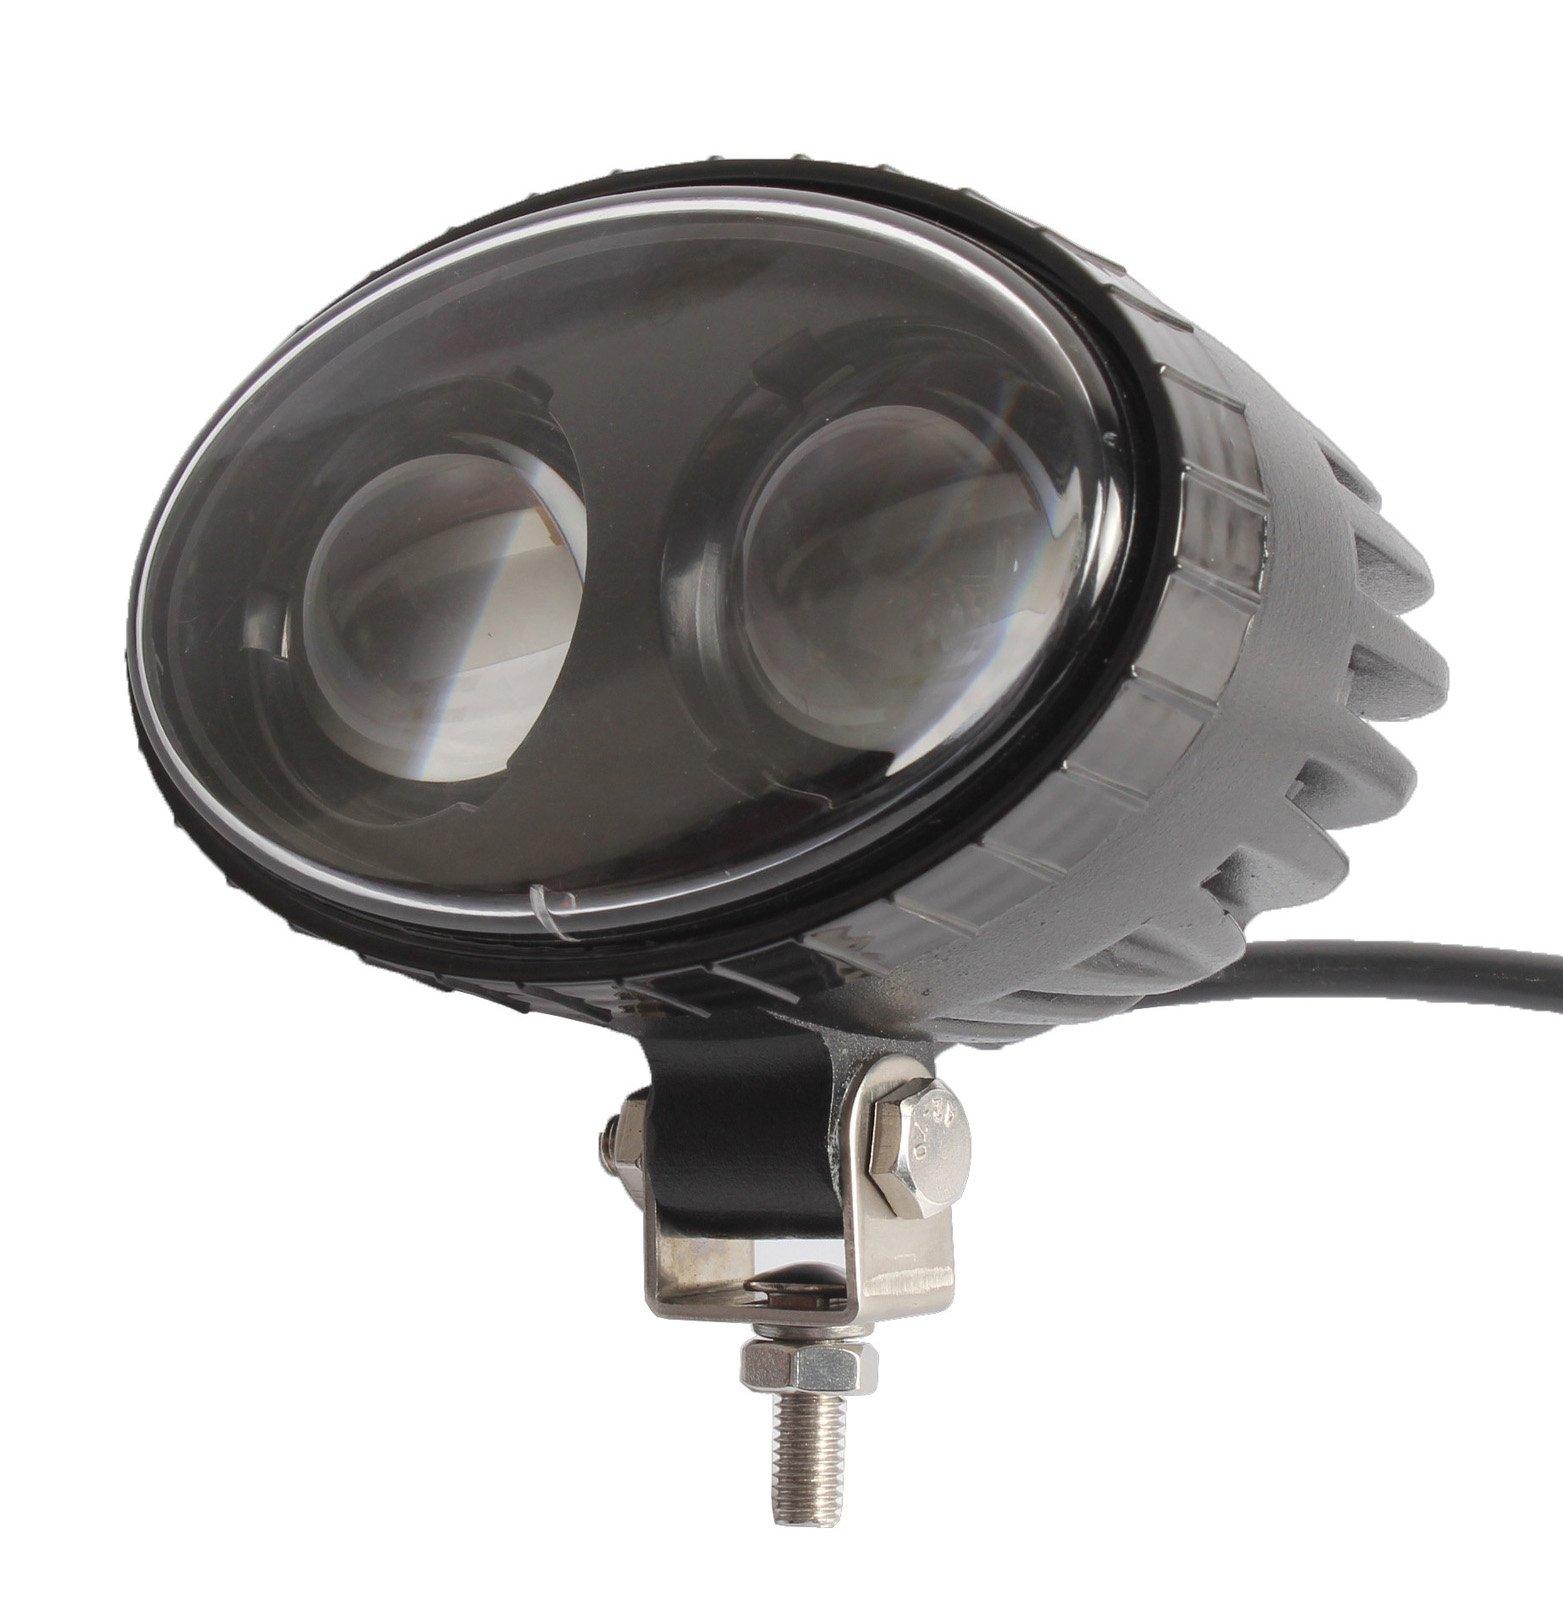 AutoPartsPro 8W 5.5 Inch CREE LED Forklift Safety Truck Lights Blue Spot Light Safe Warning Lamp IP68 Aluminium Alloy Housing